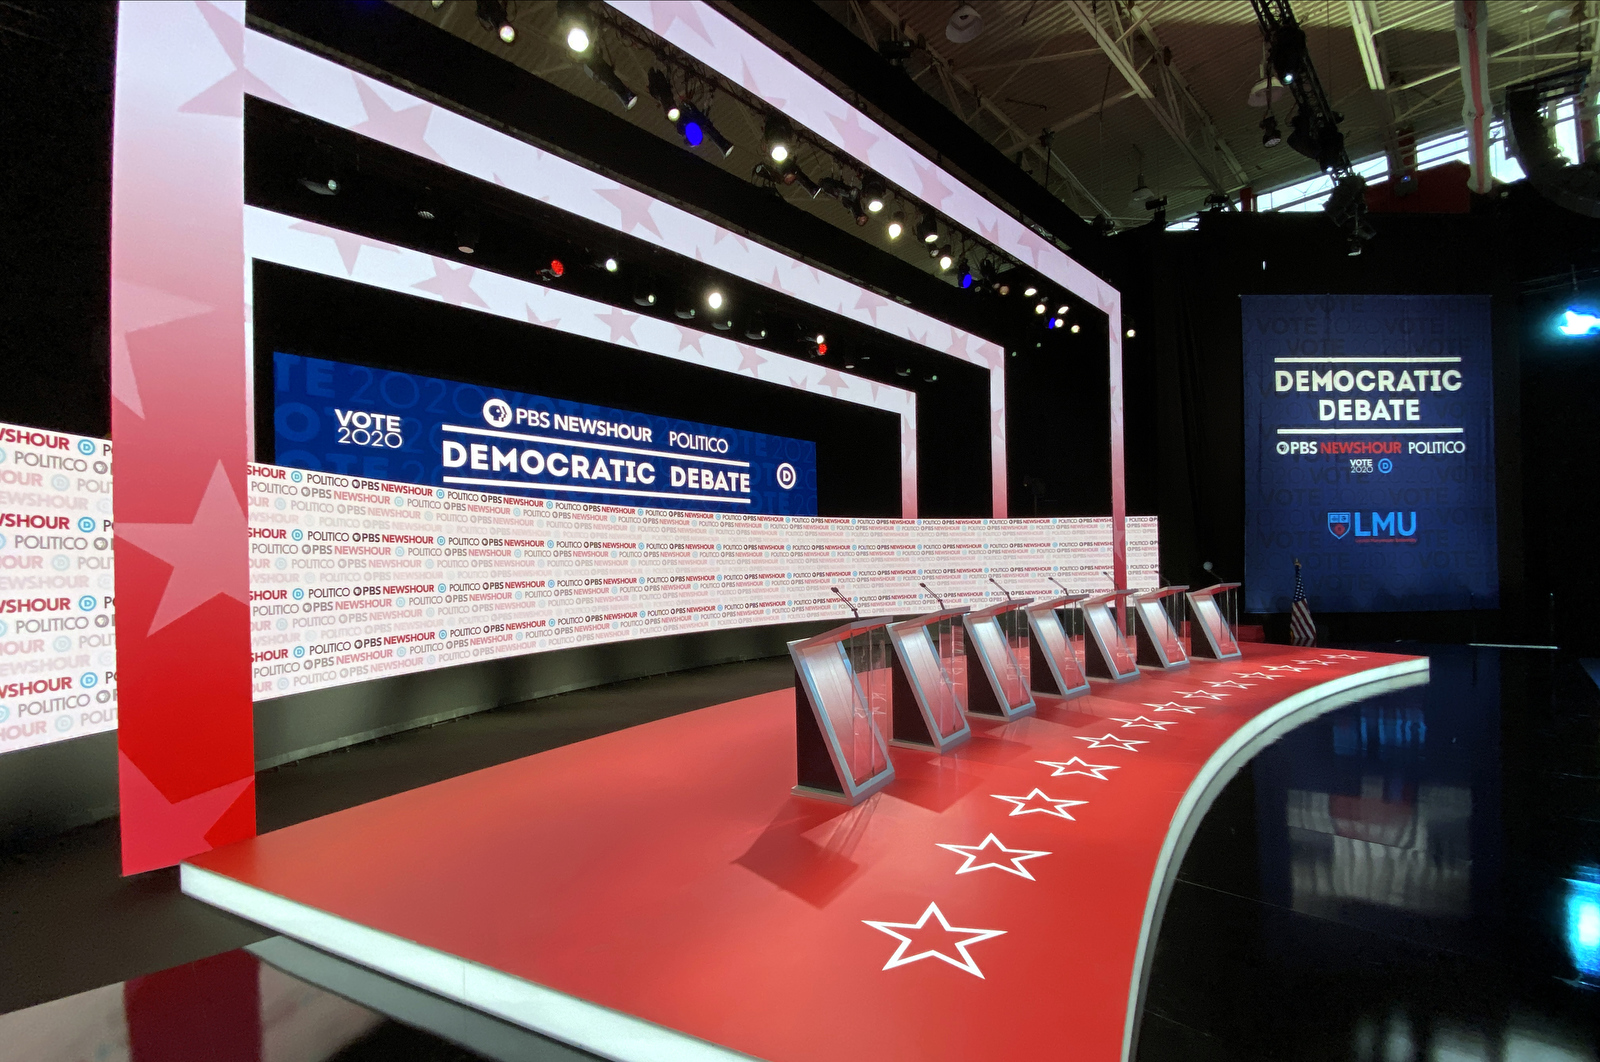 NCS_PBS-NewsHour_Politico_Democratic-Debate_003